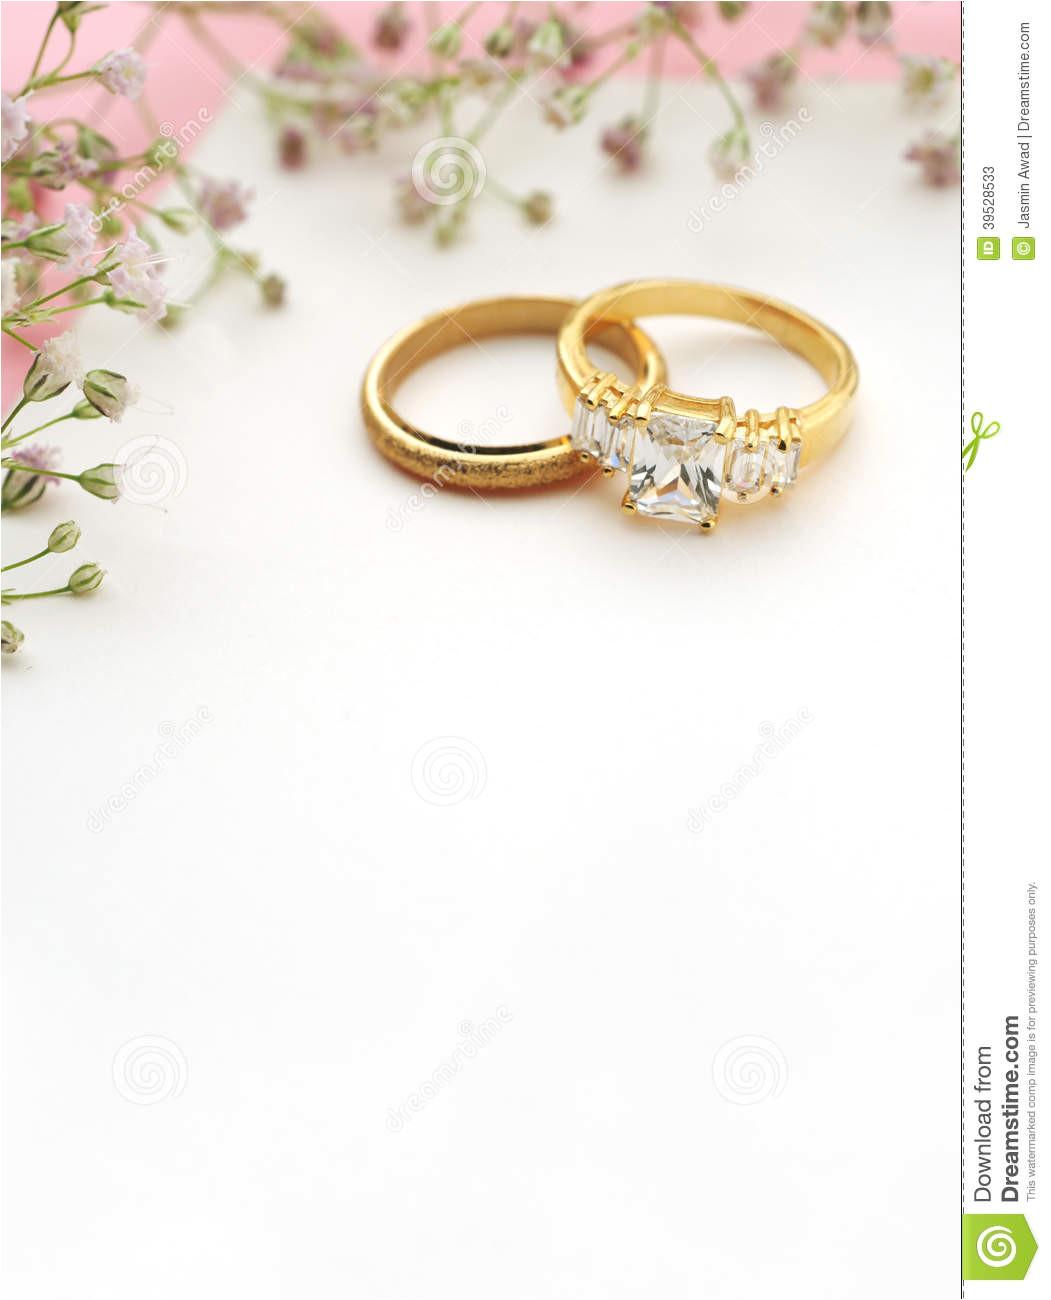 stock photos wedding invitation copy space blank card rings image39528533